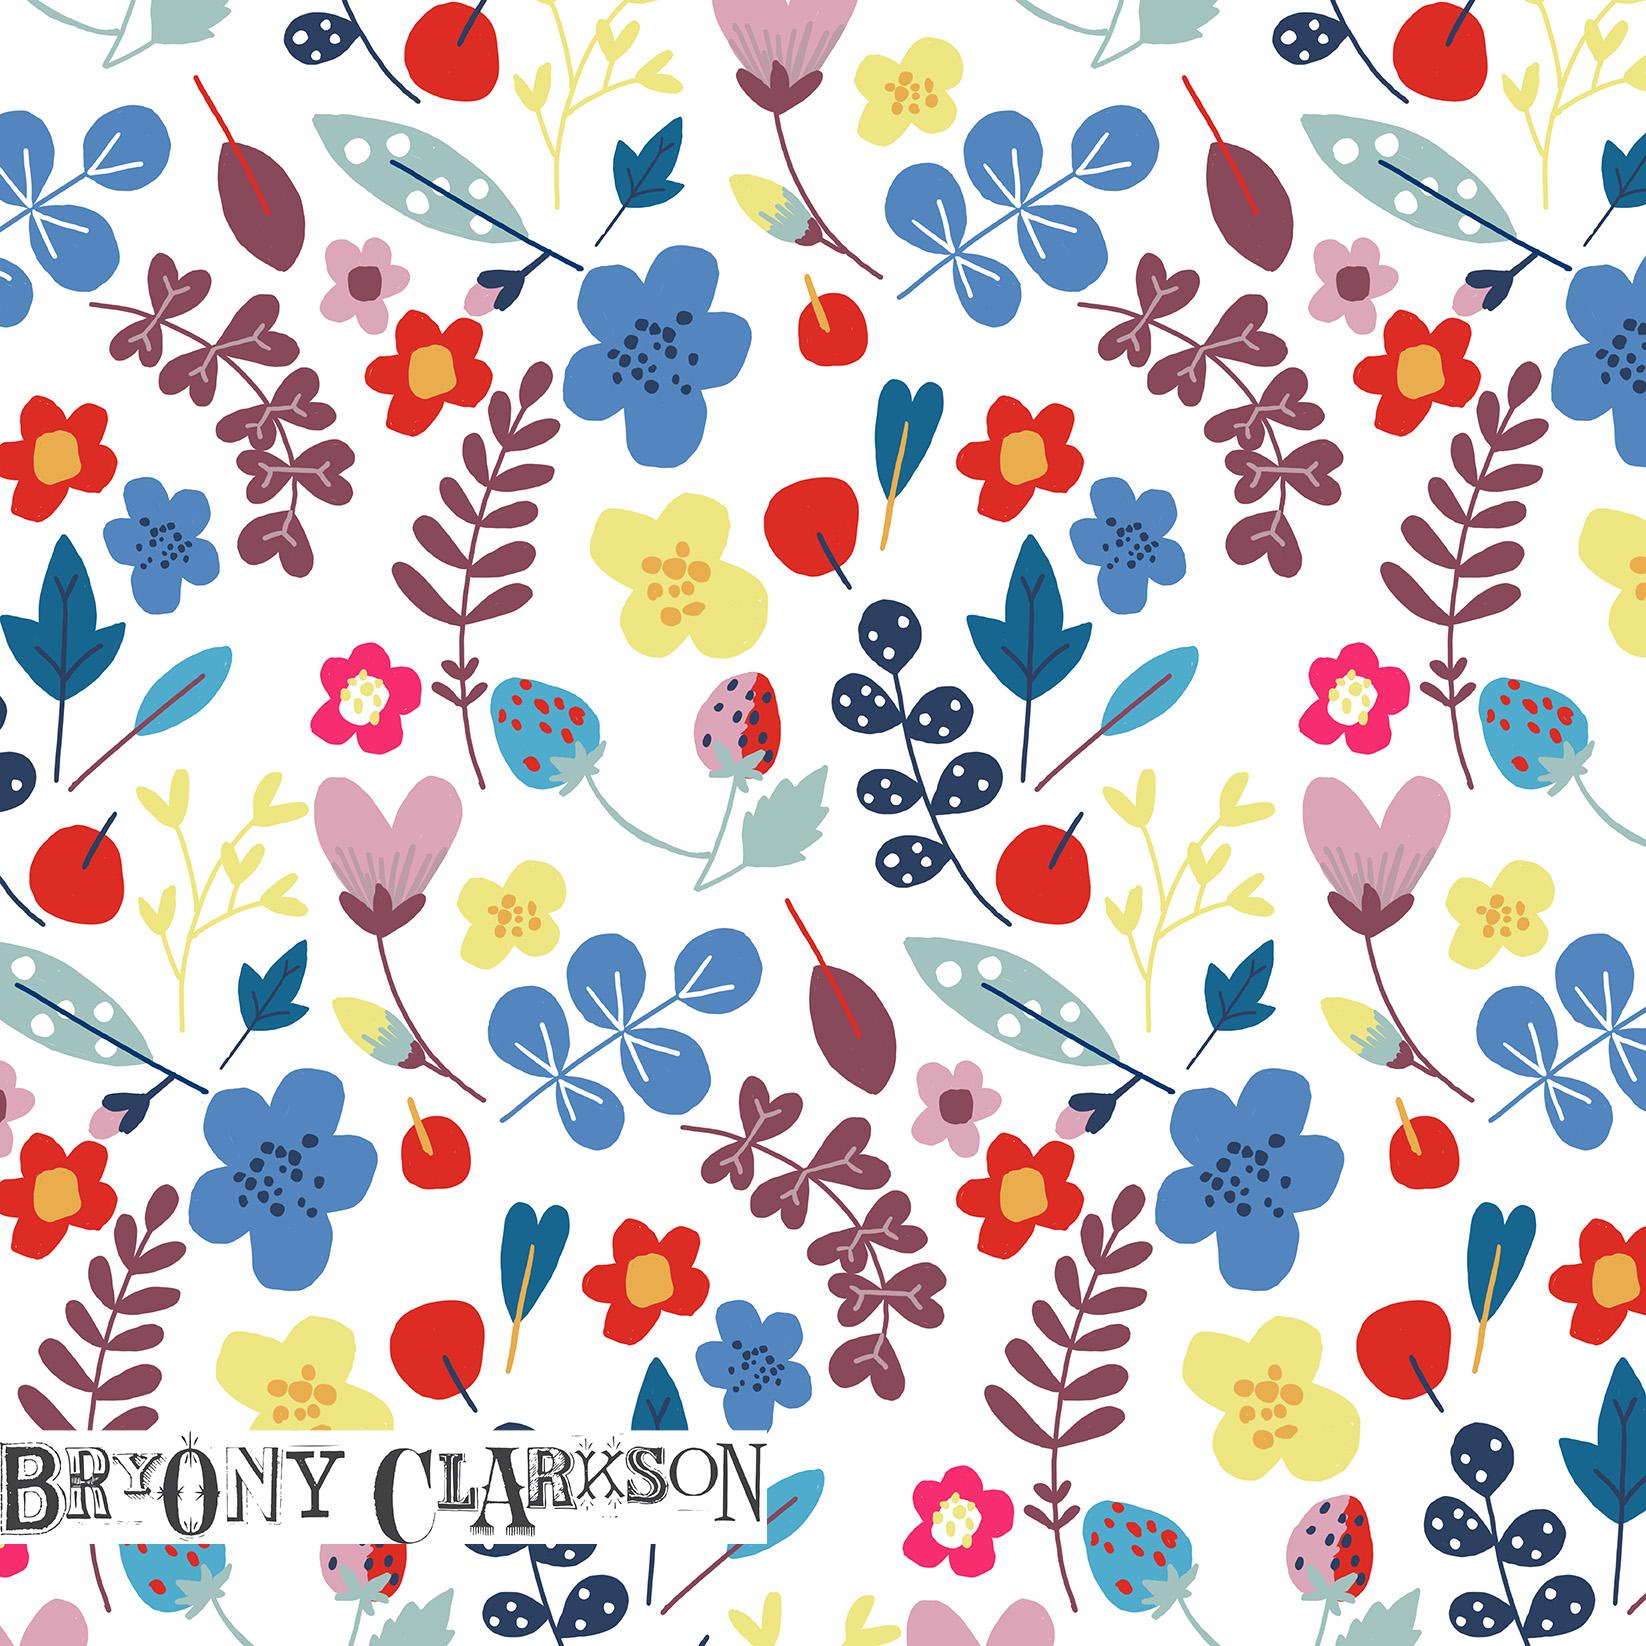 BC_Jaunty_Floral_LR copy.jpg